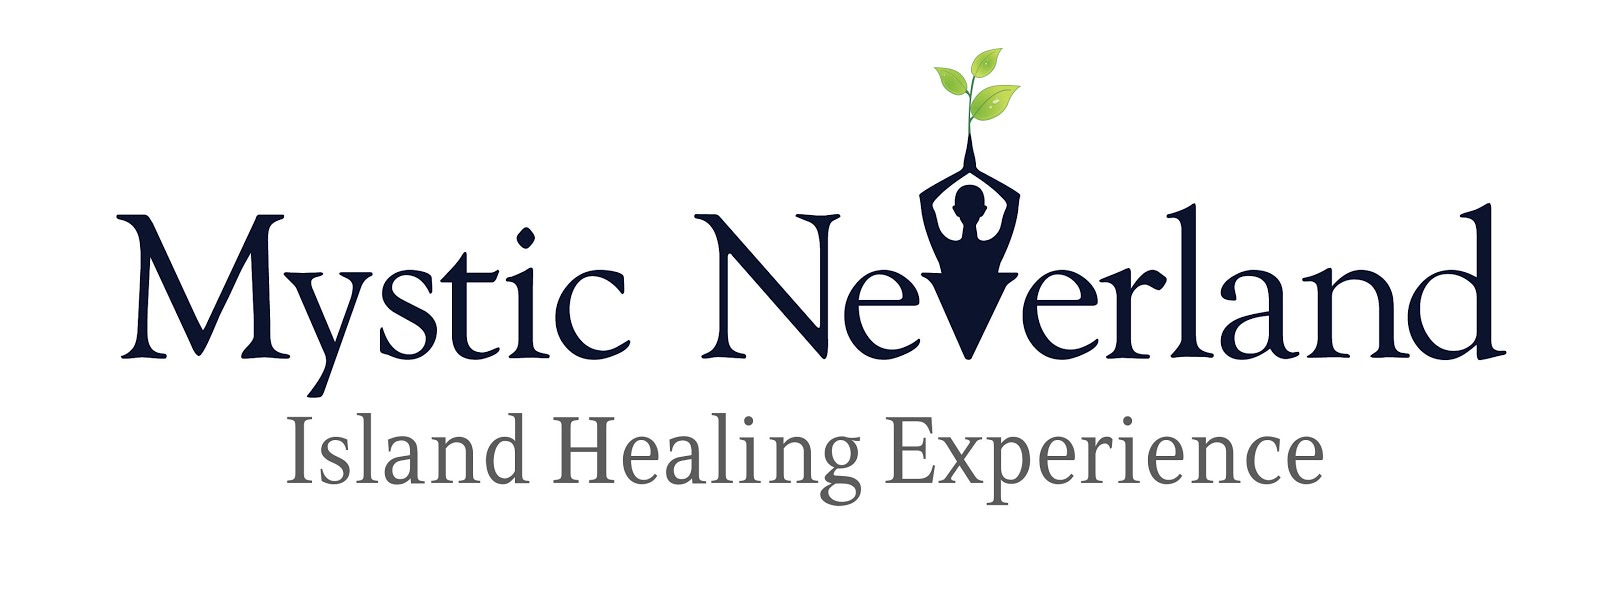 Mystic Neverland Island Healing